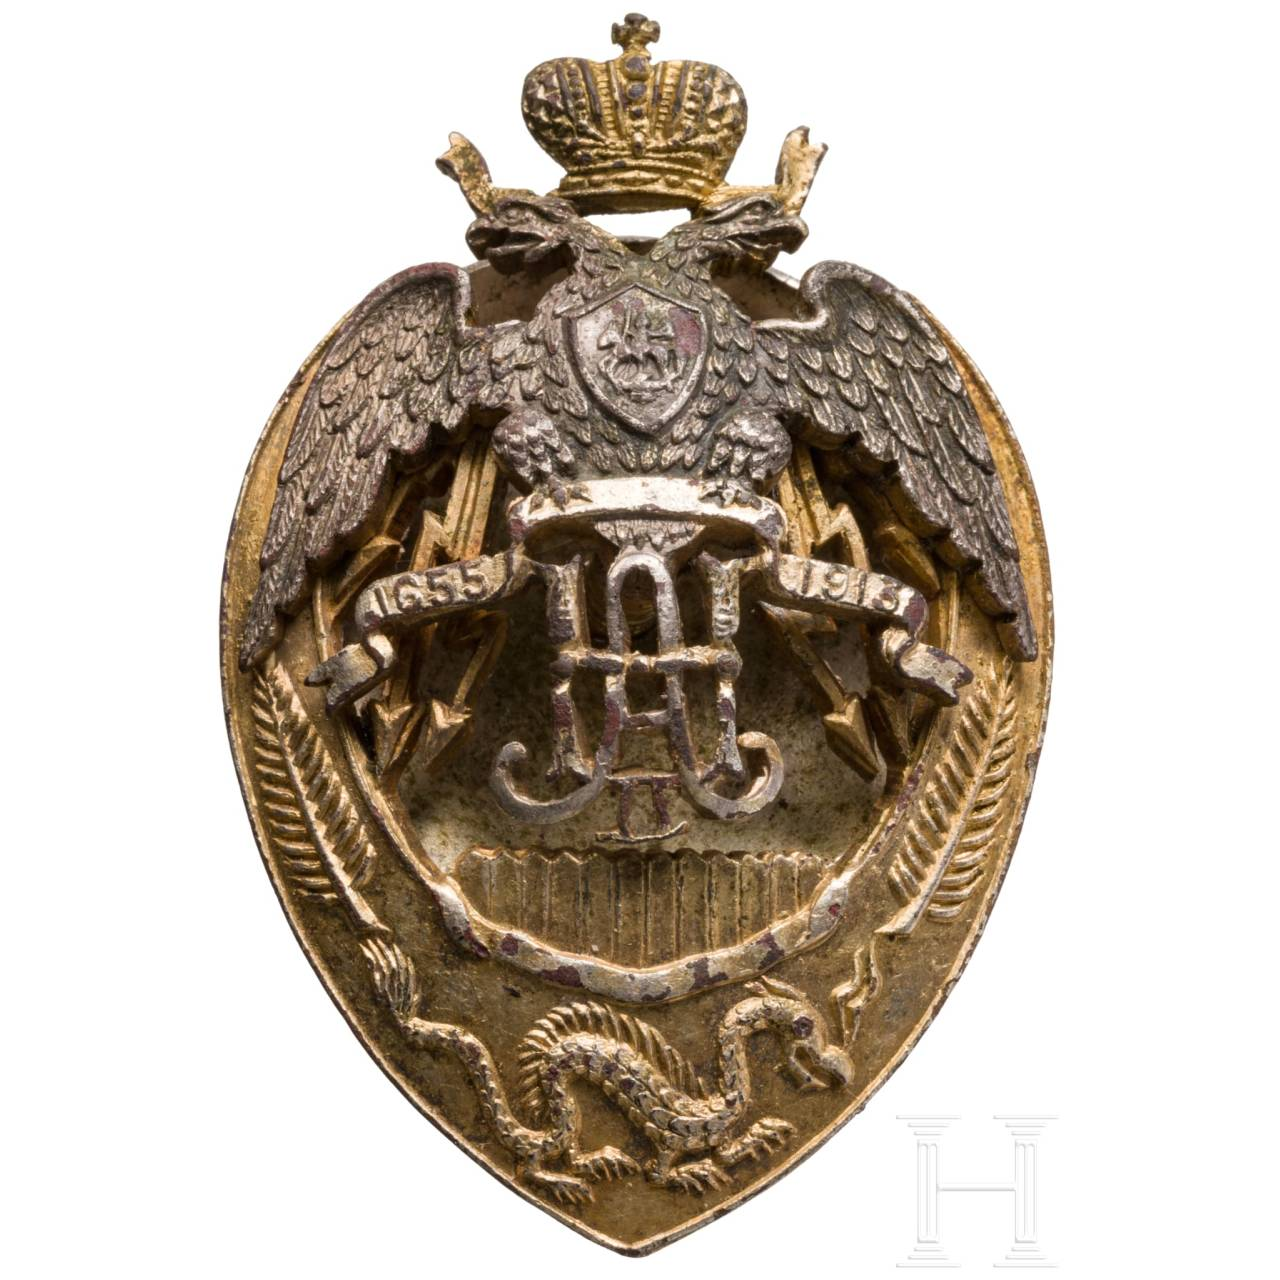 A Russian badge of the Zabaykalsky Cossack Regiment, circa 1915